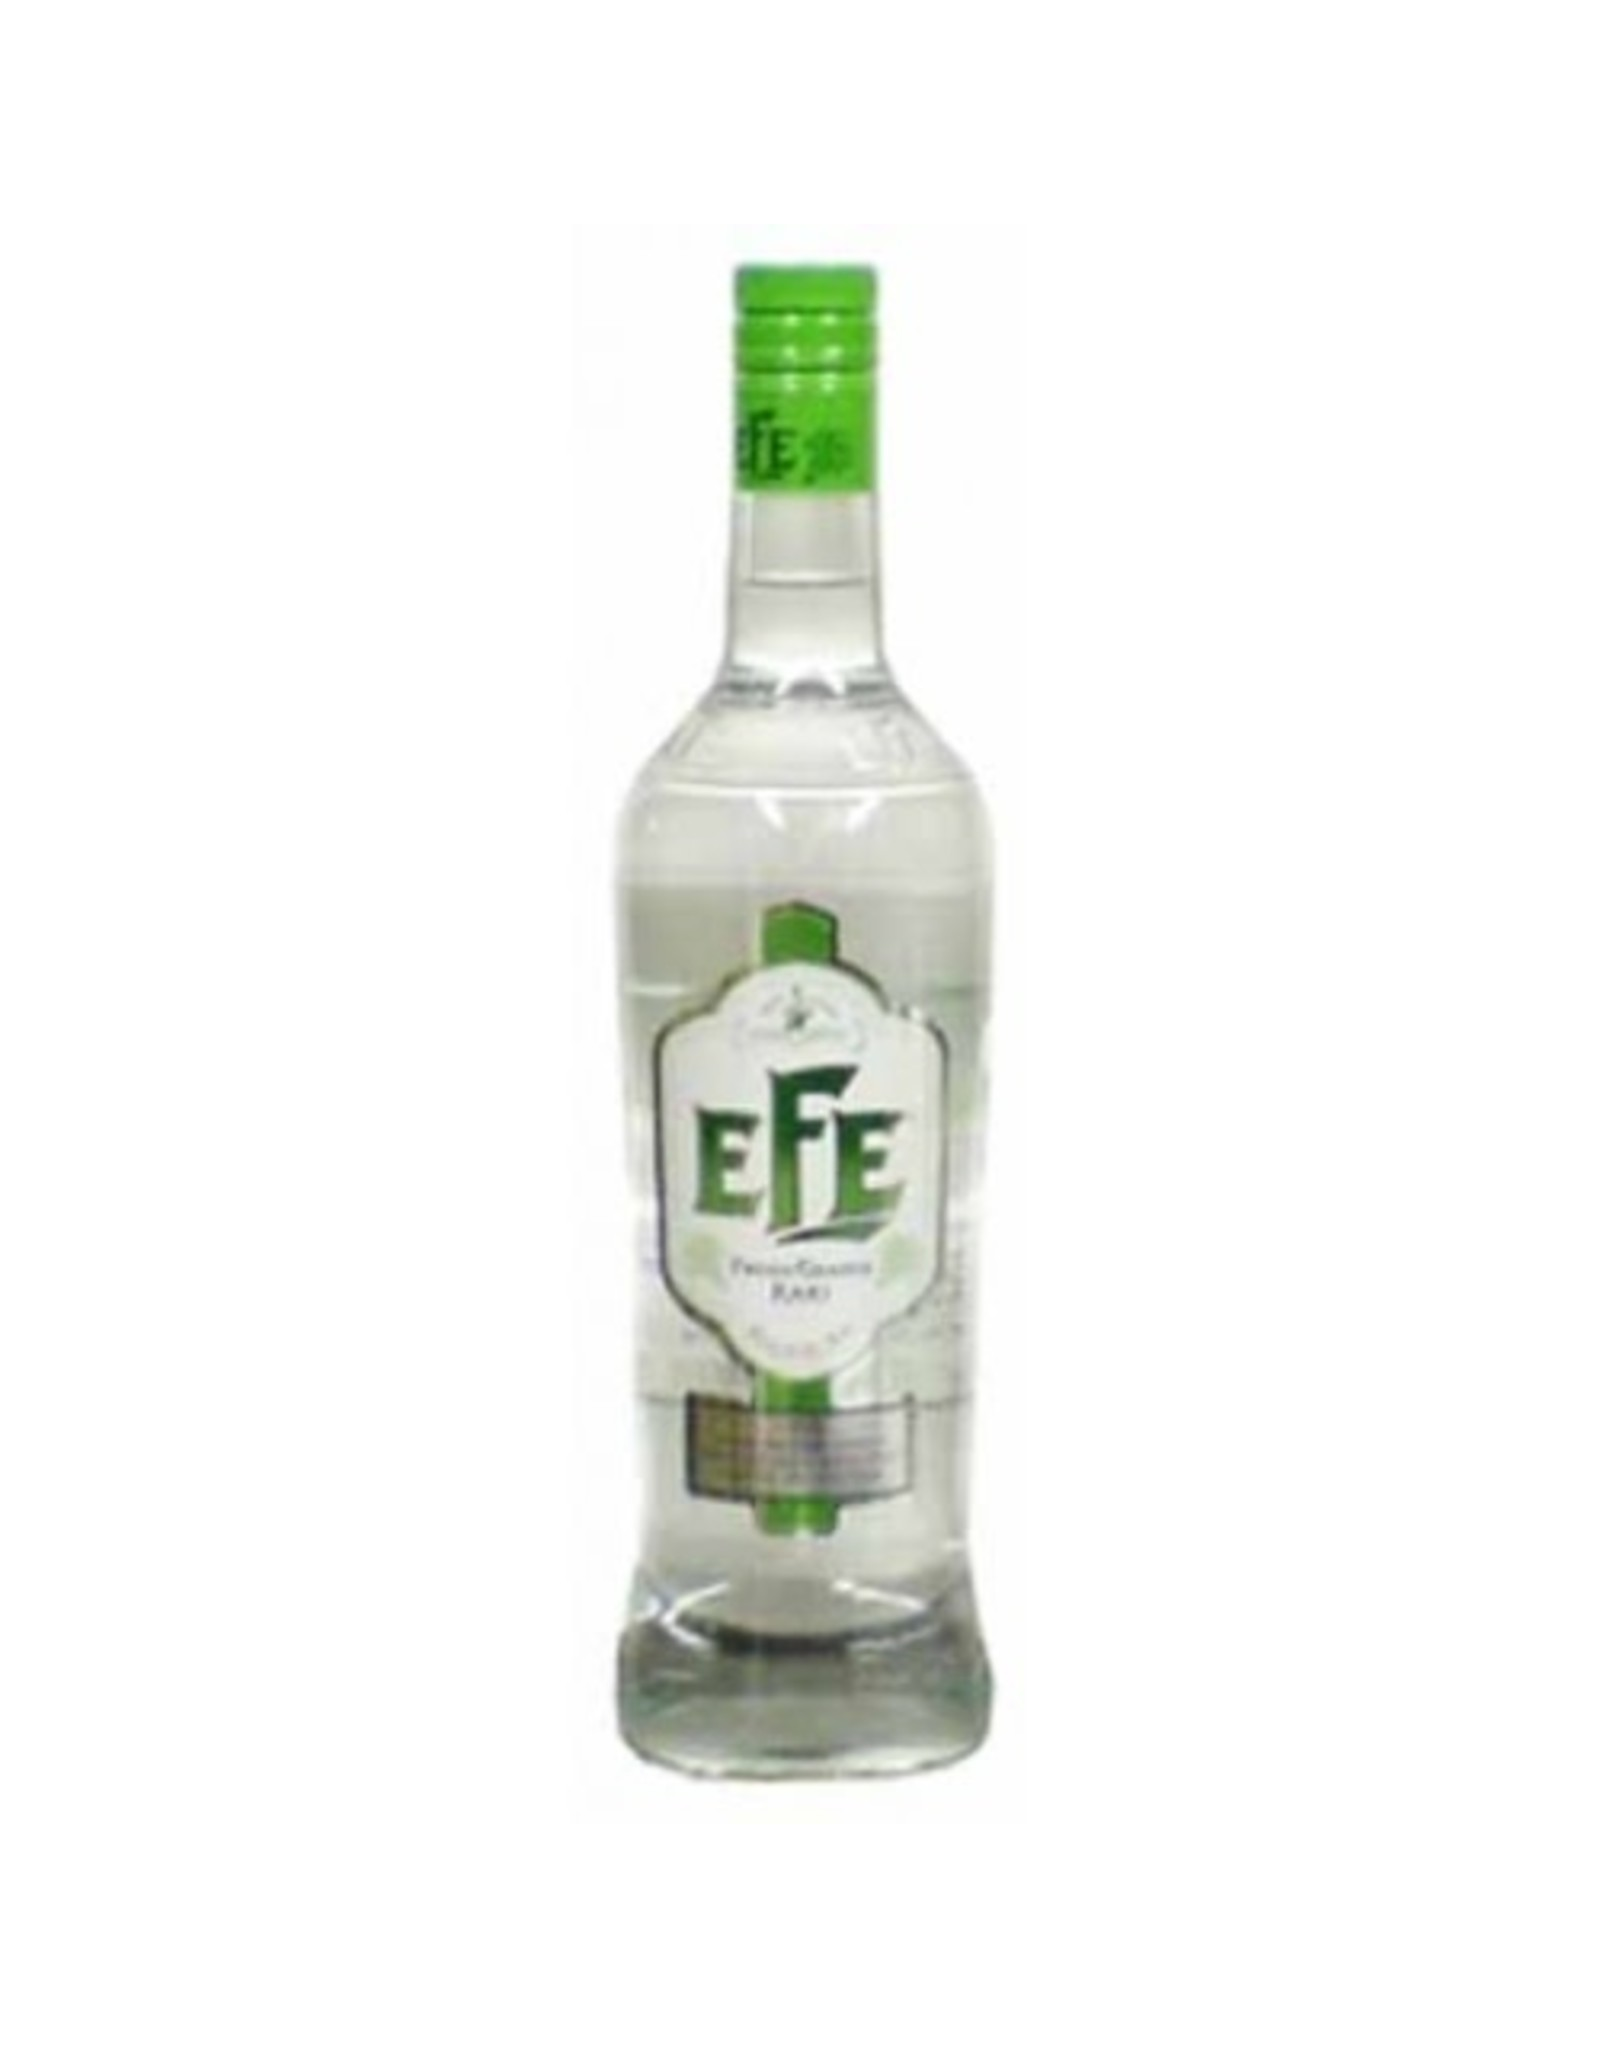 EFE-RAKI FRESH GRAPES GREEN 750ML